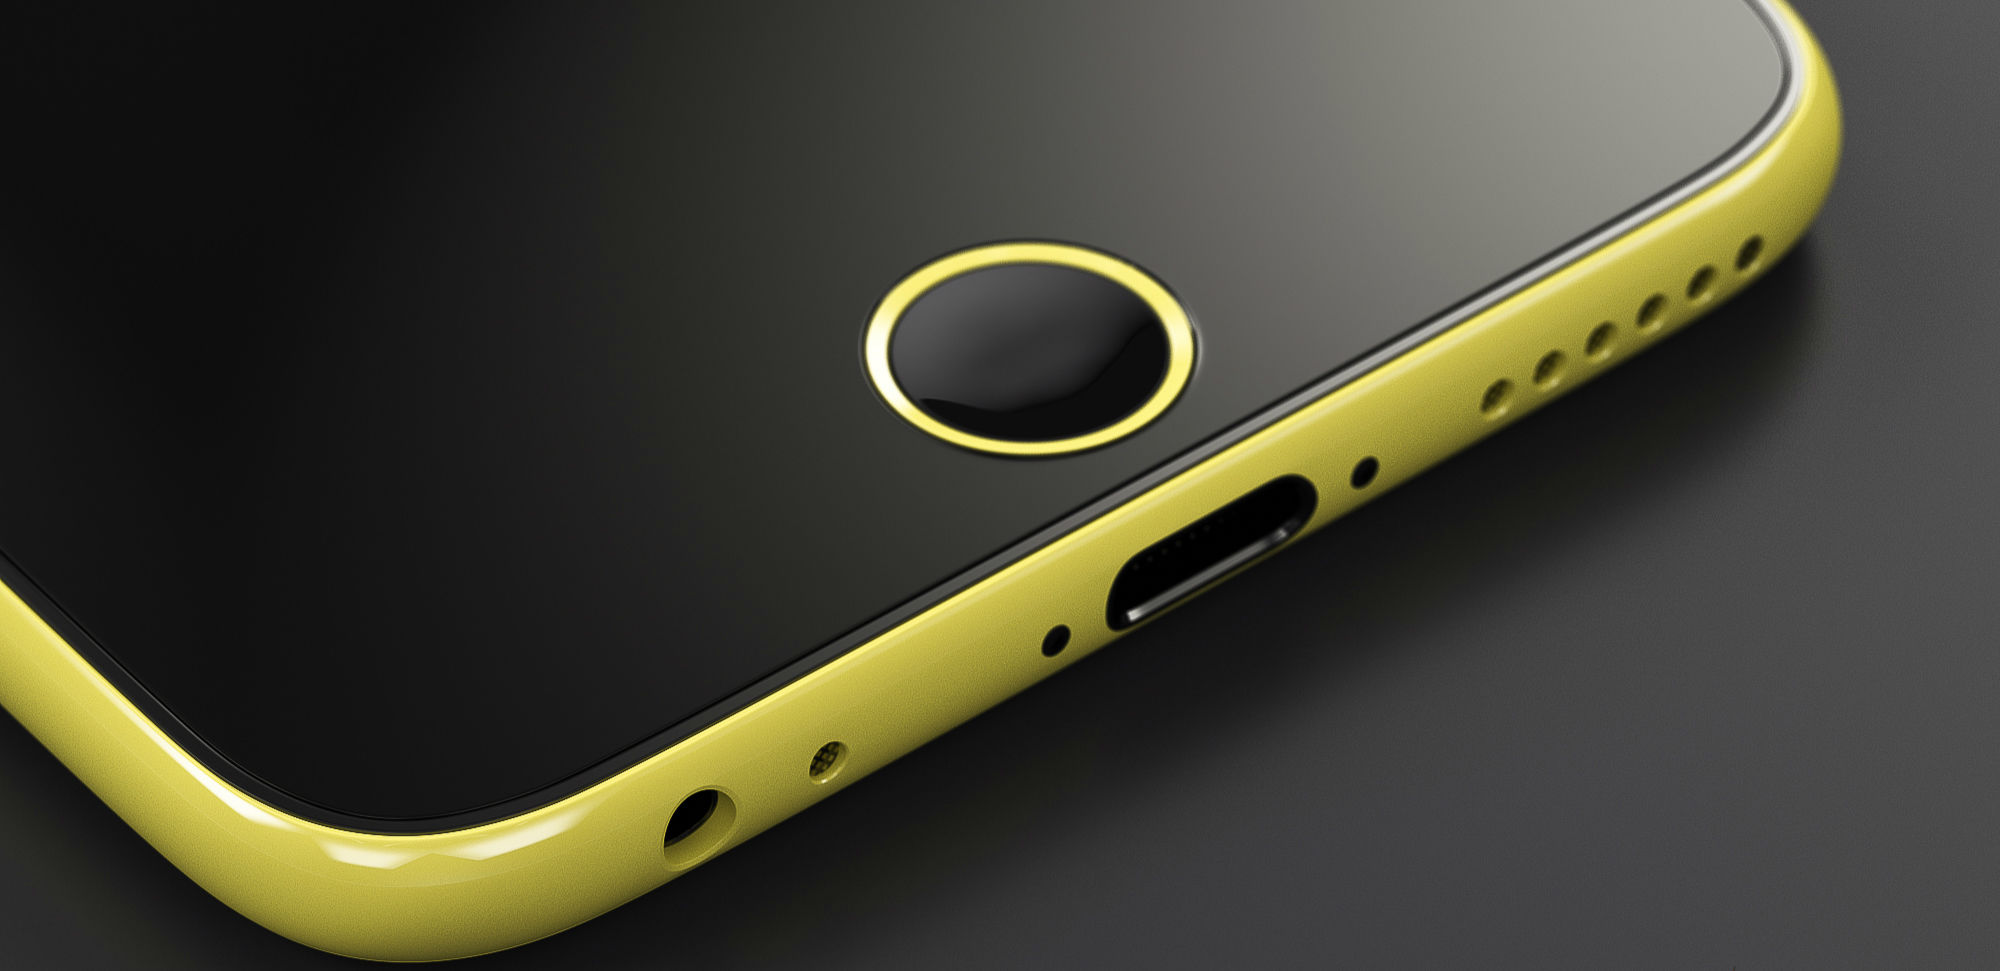 iPhone 6C保护套曝光 | 极客早知道2015年8月27日